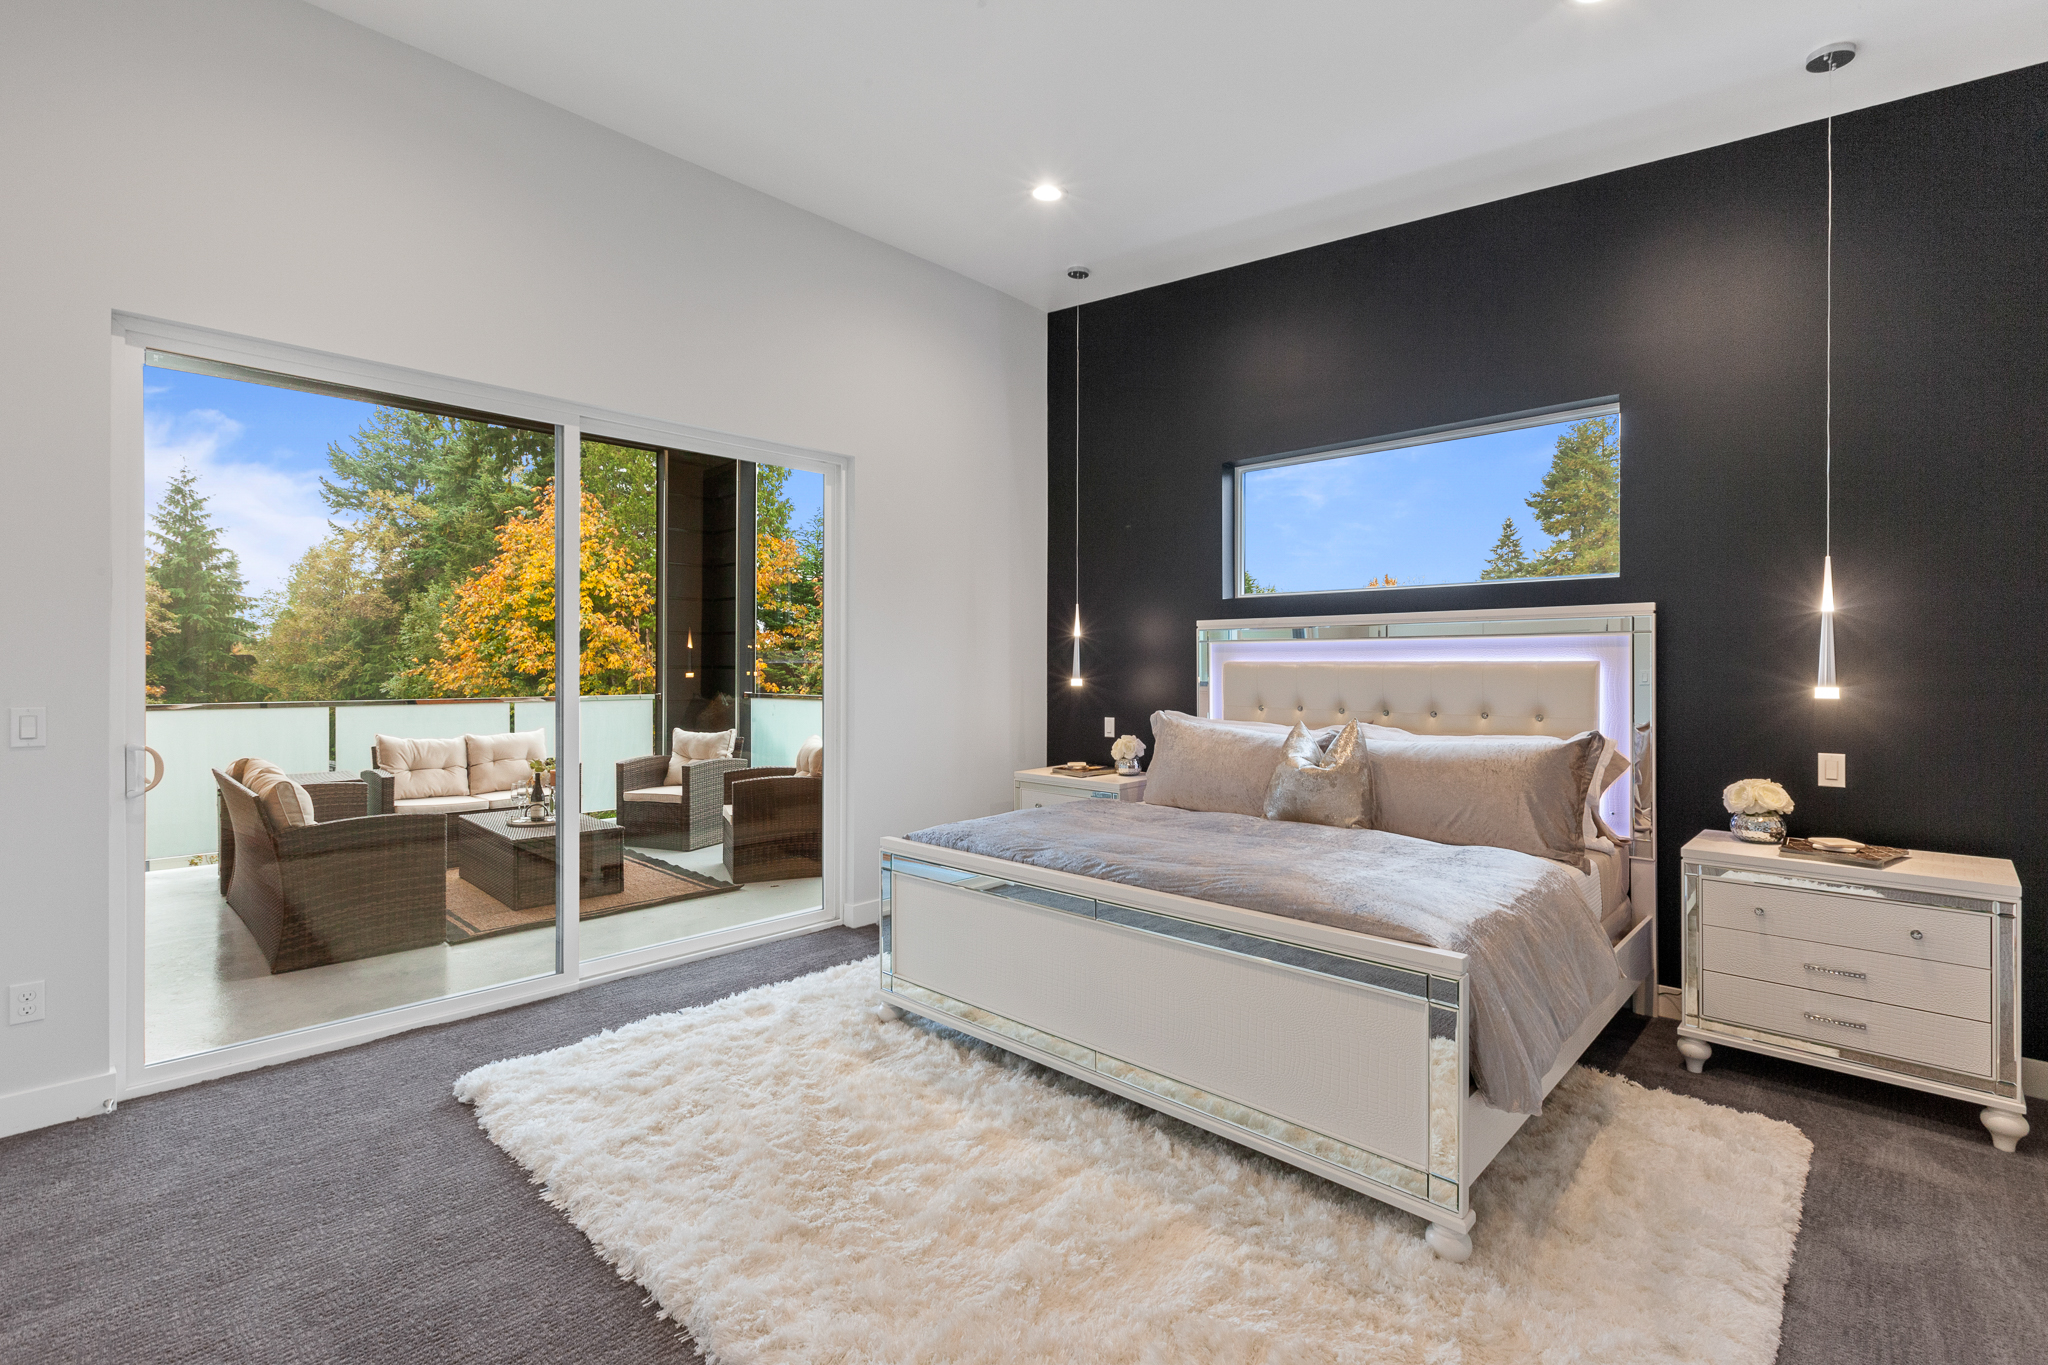 Master Bedroom - Luxury Real Estate - 18109 84th Ave W, Edmonds